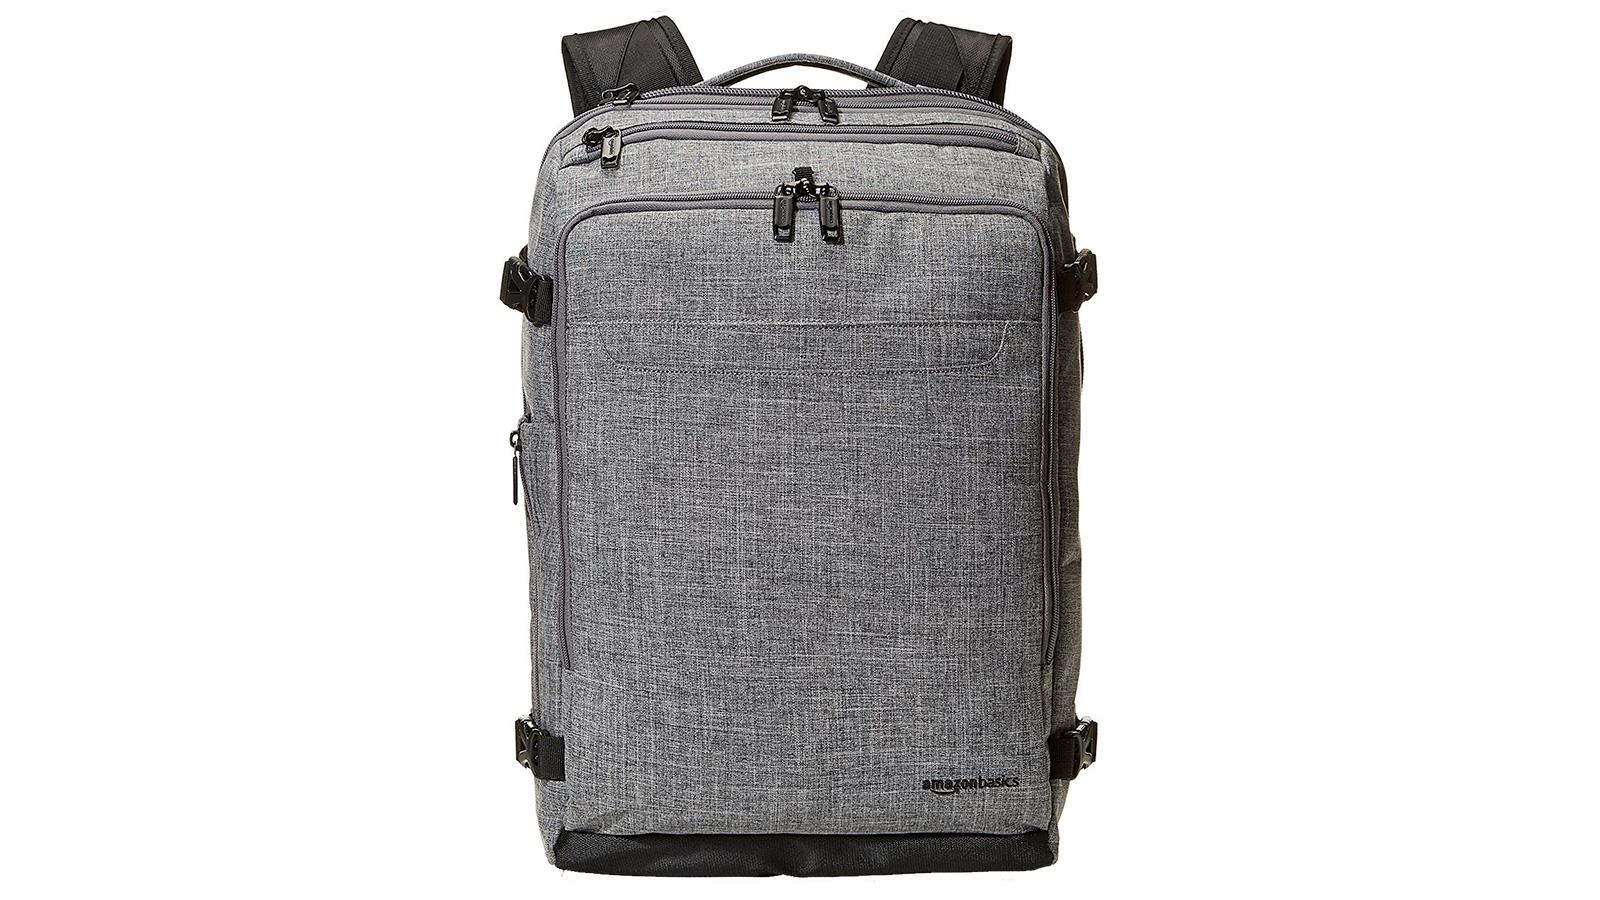 amazon-basics-slim-carry-on-weekender-backpack-01.jpg